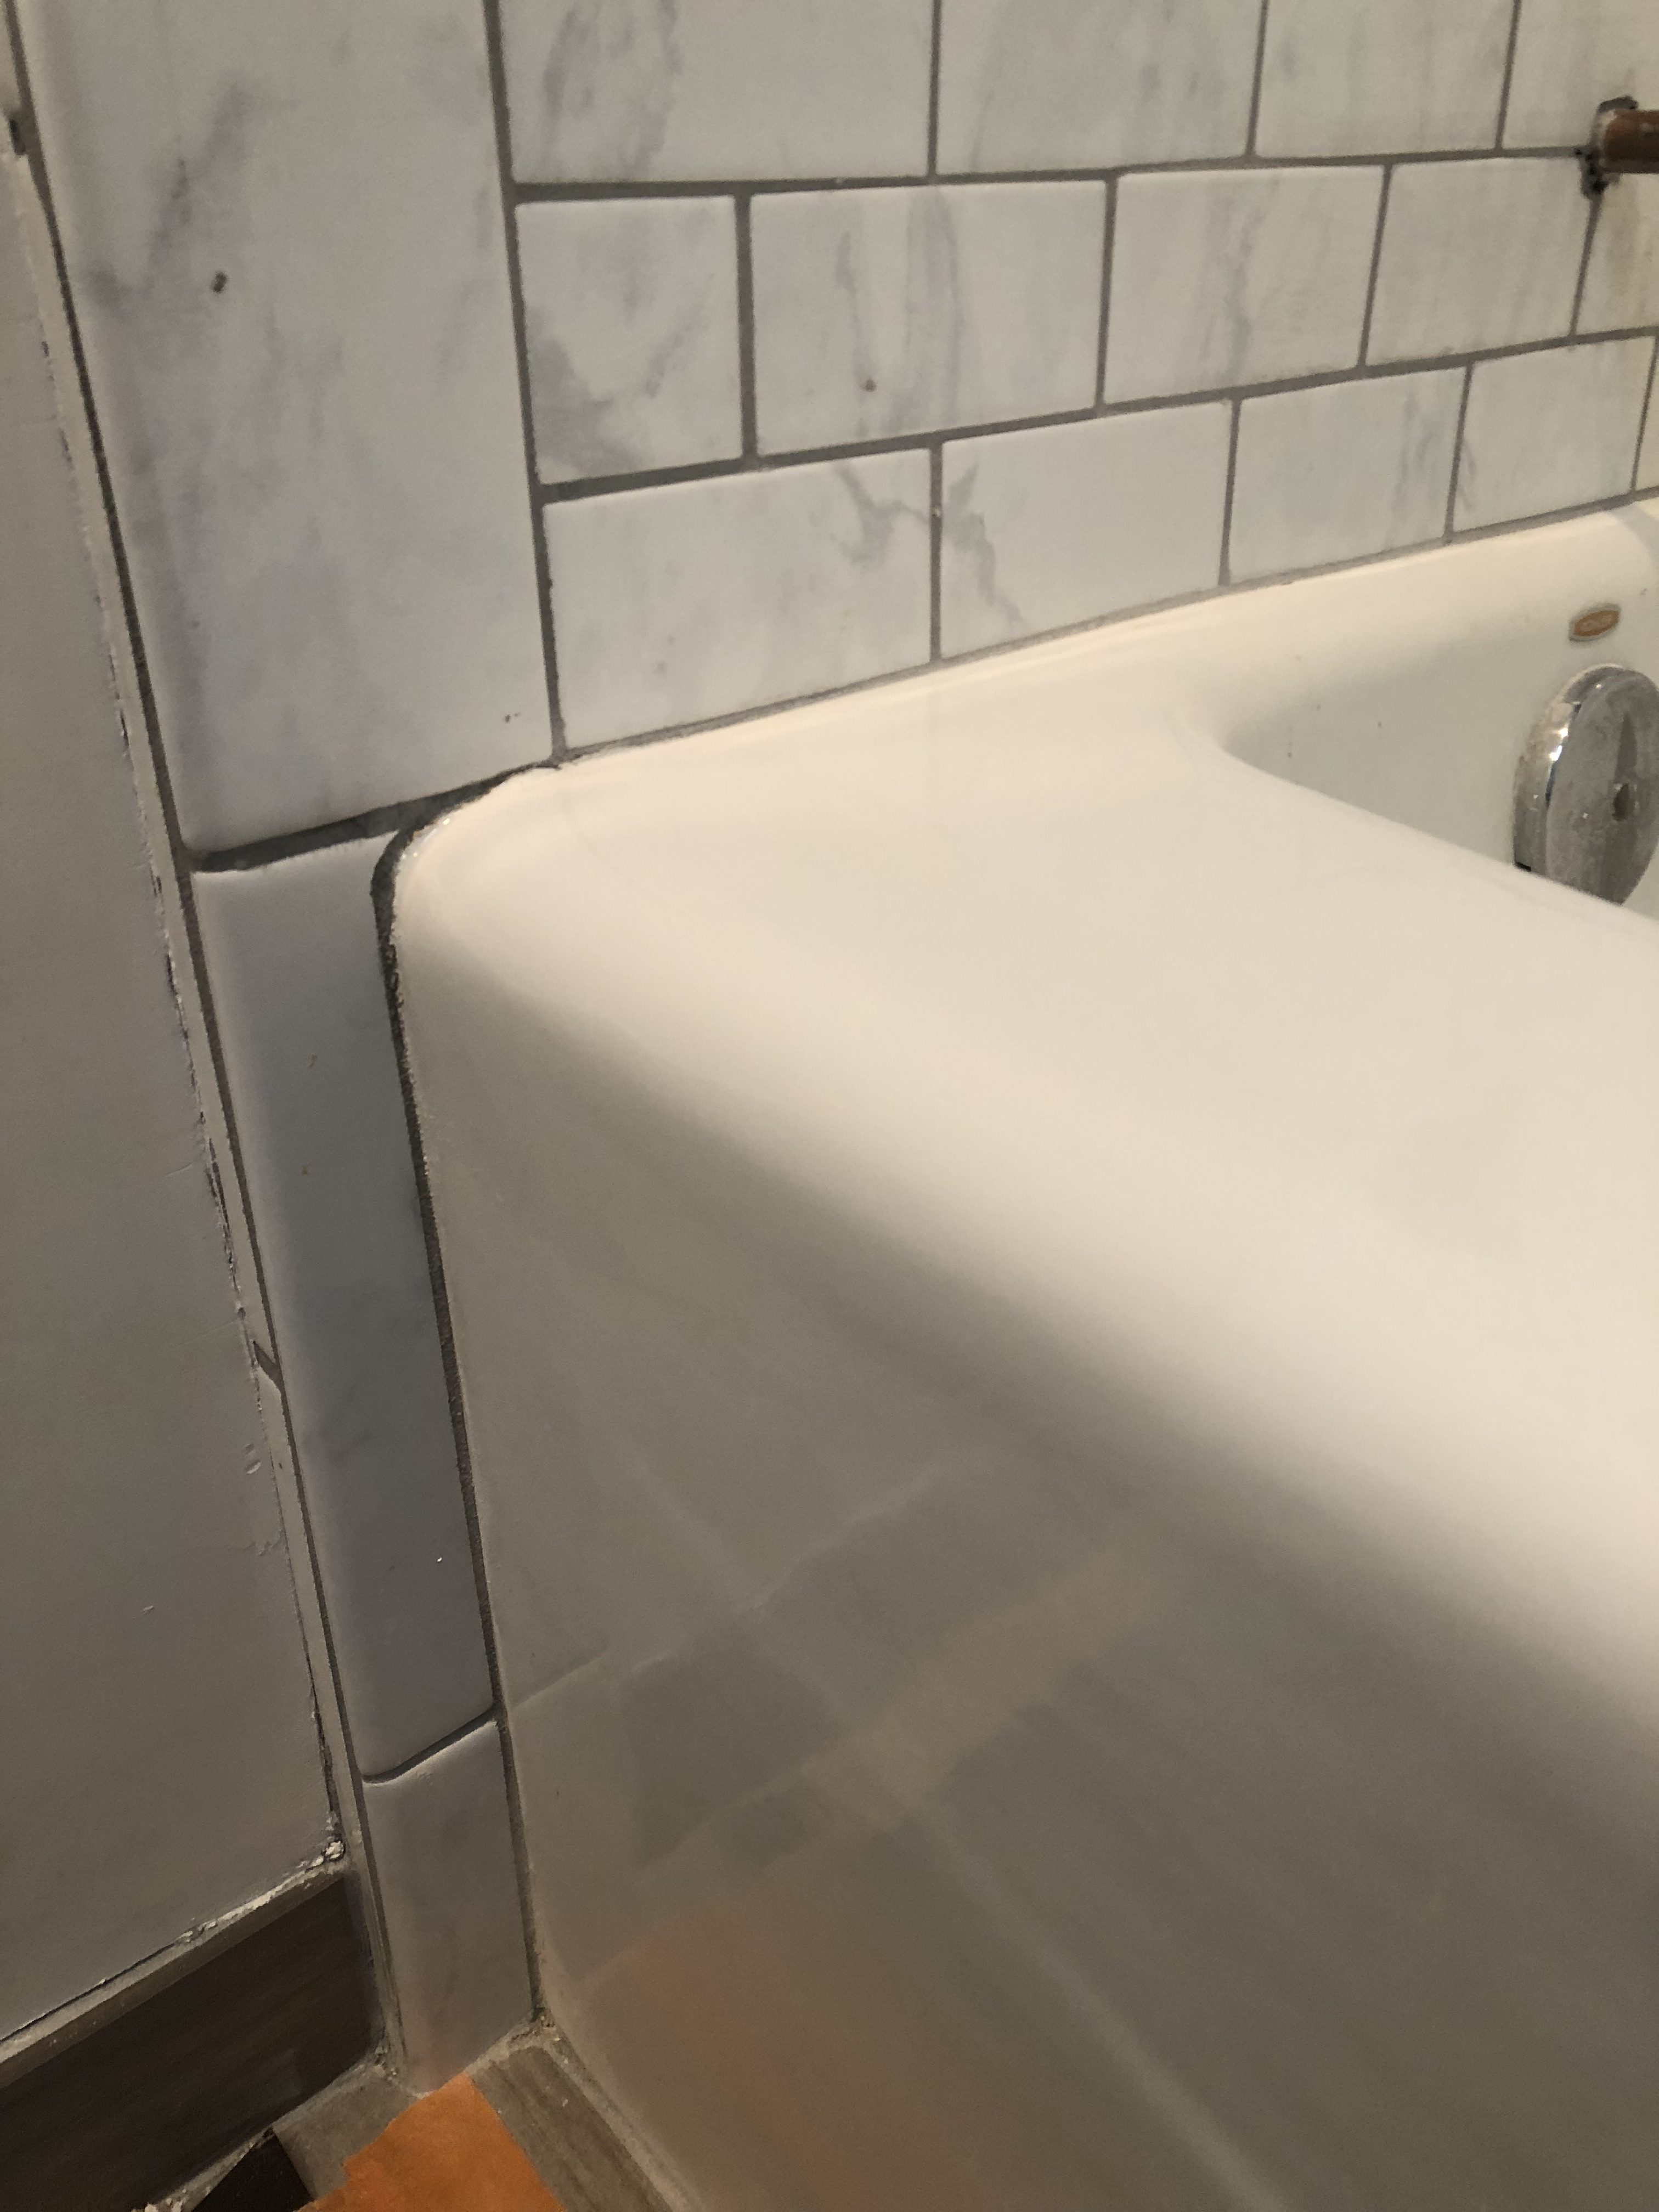 Bathtub Refinishing After Spot Repair - NuFinishiPro